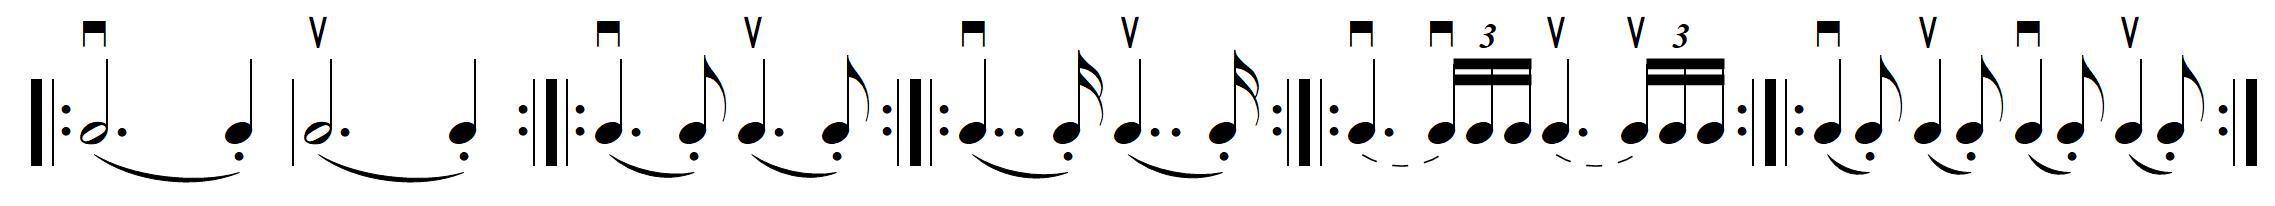 hooked basic rhythms